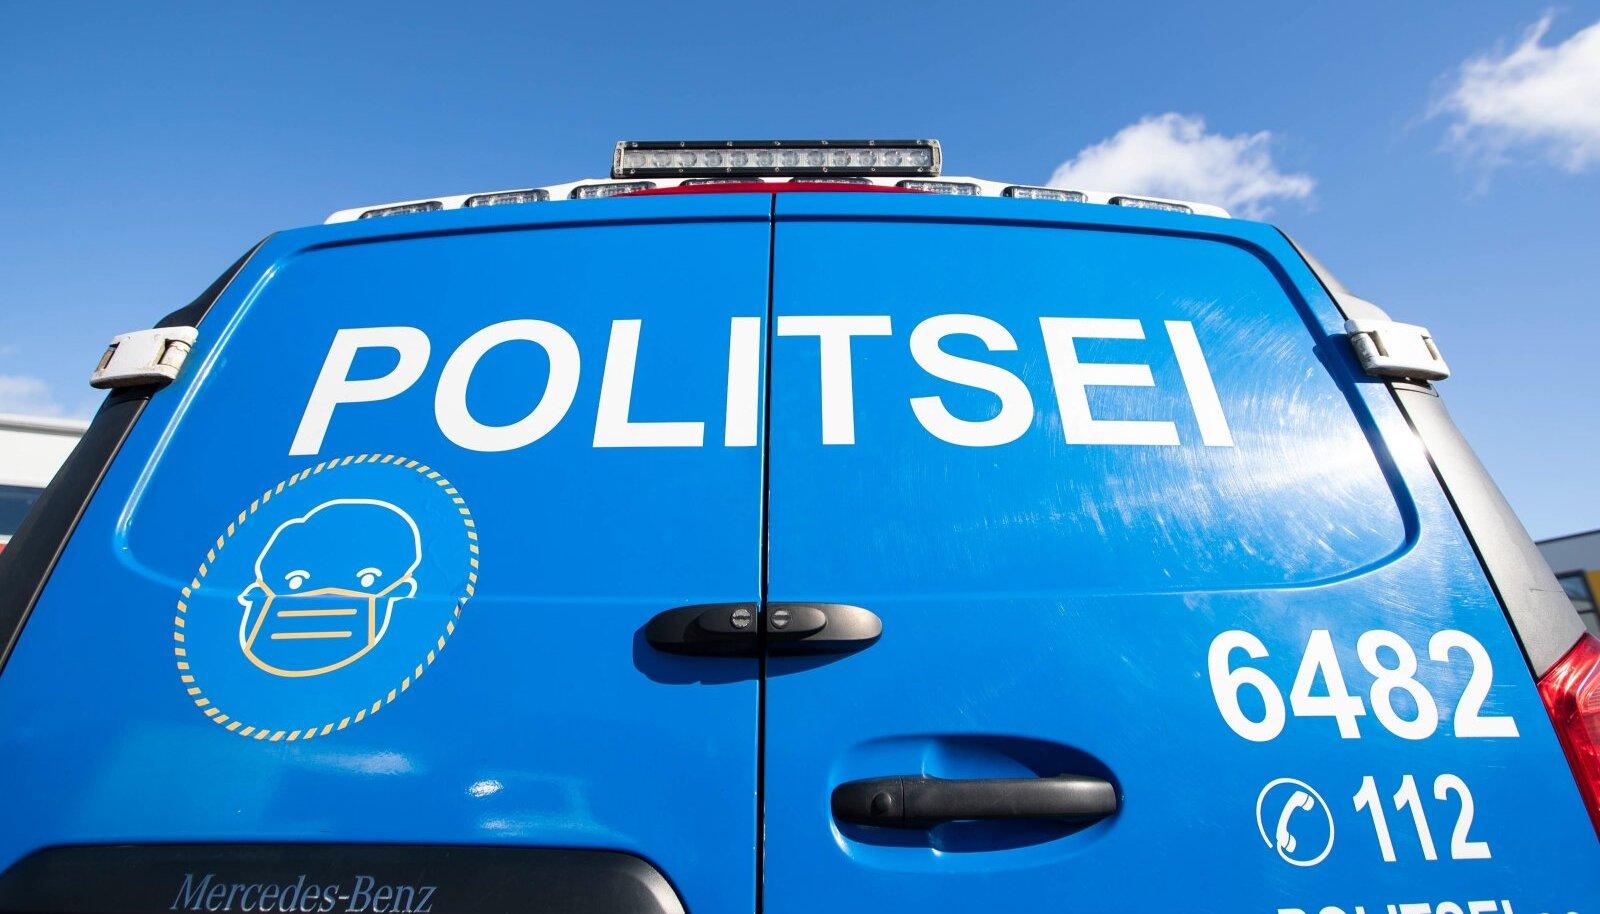 Politseibuss, pilt on illustratiivne.